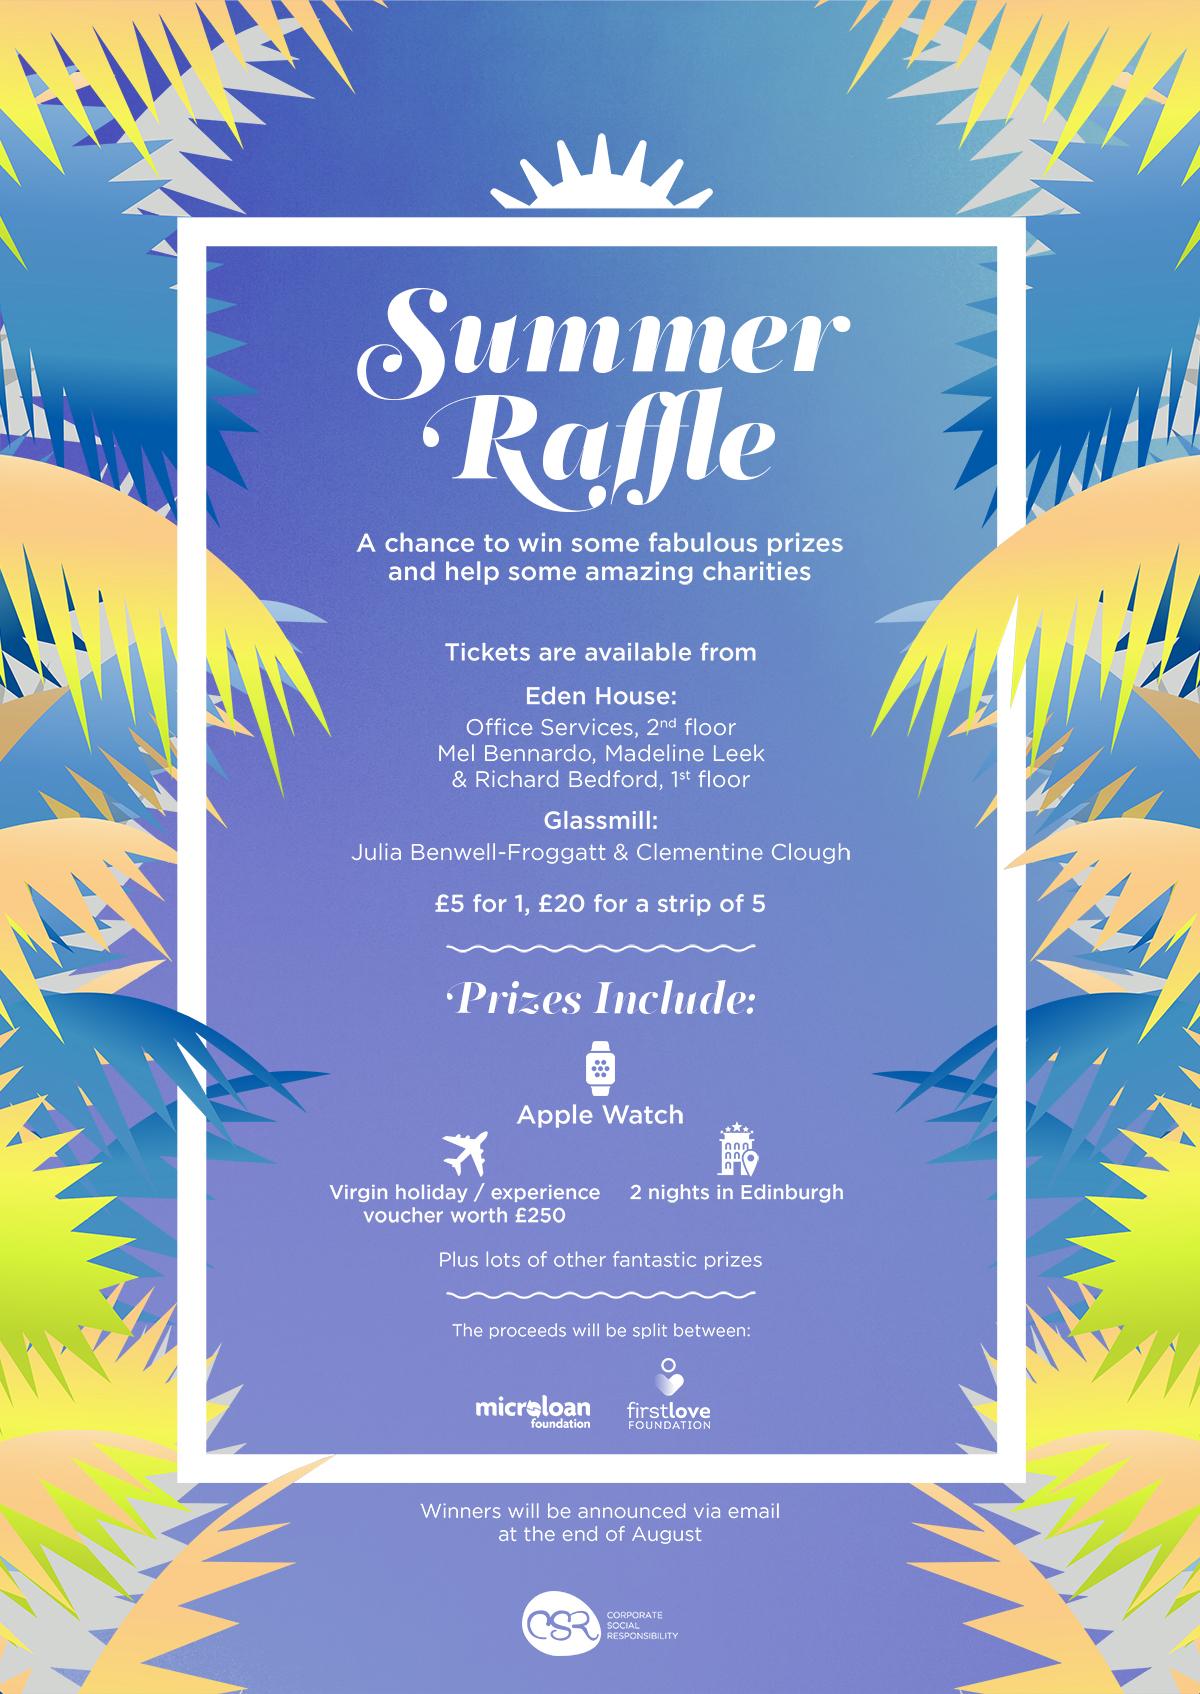 CSR-Summer-Raffle-006-Portfolio.jpg